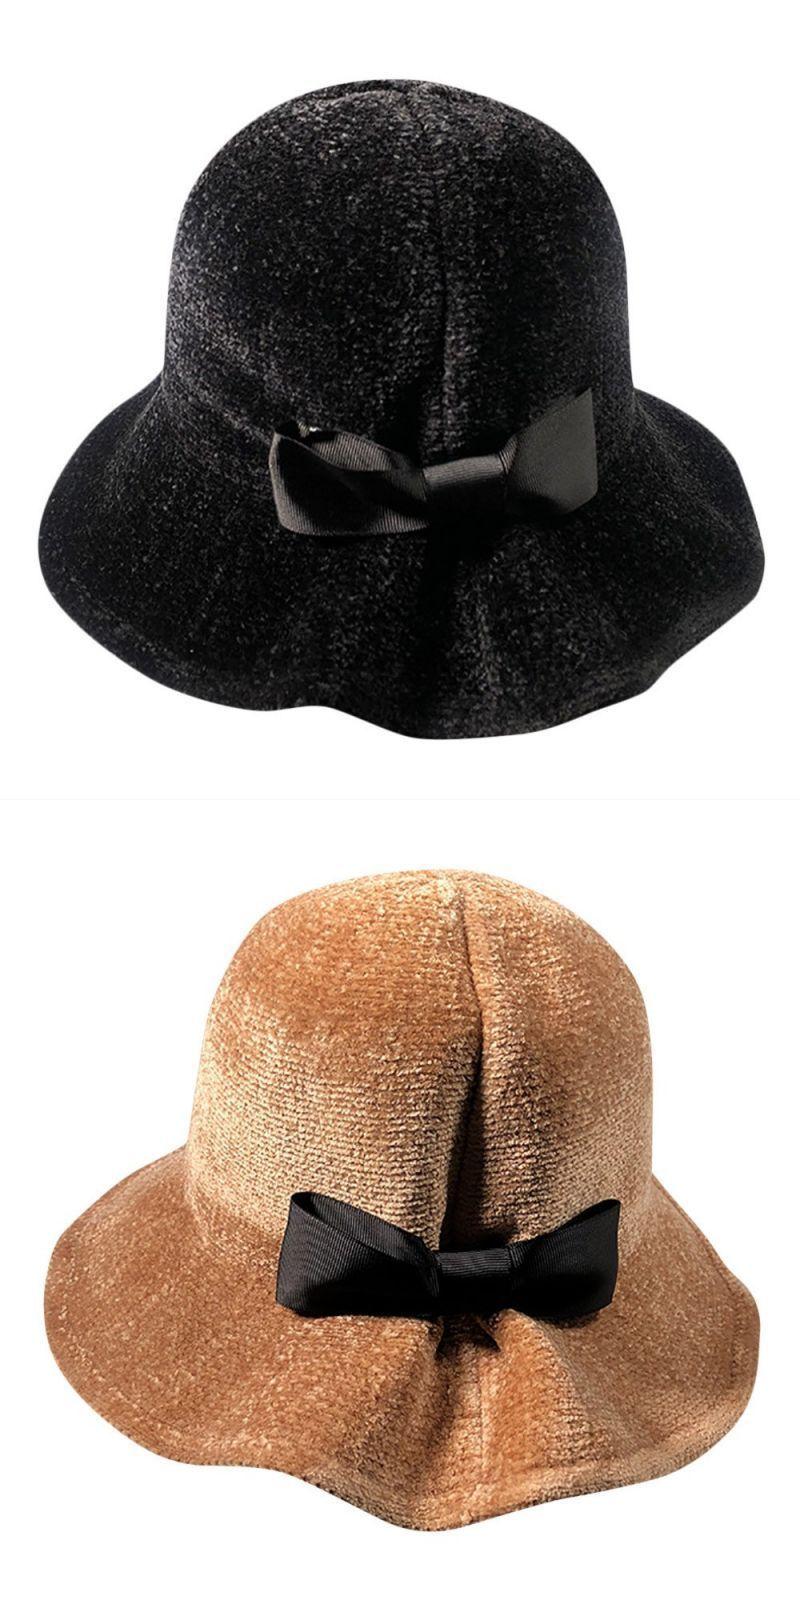 bdb5eec449405 Women winter keep warm hat fisherman bowknot caps ladies winter bow hat  fisherman hat winter hats